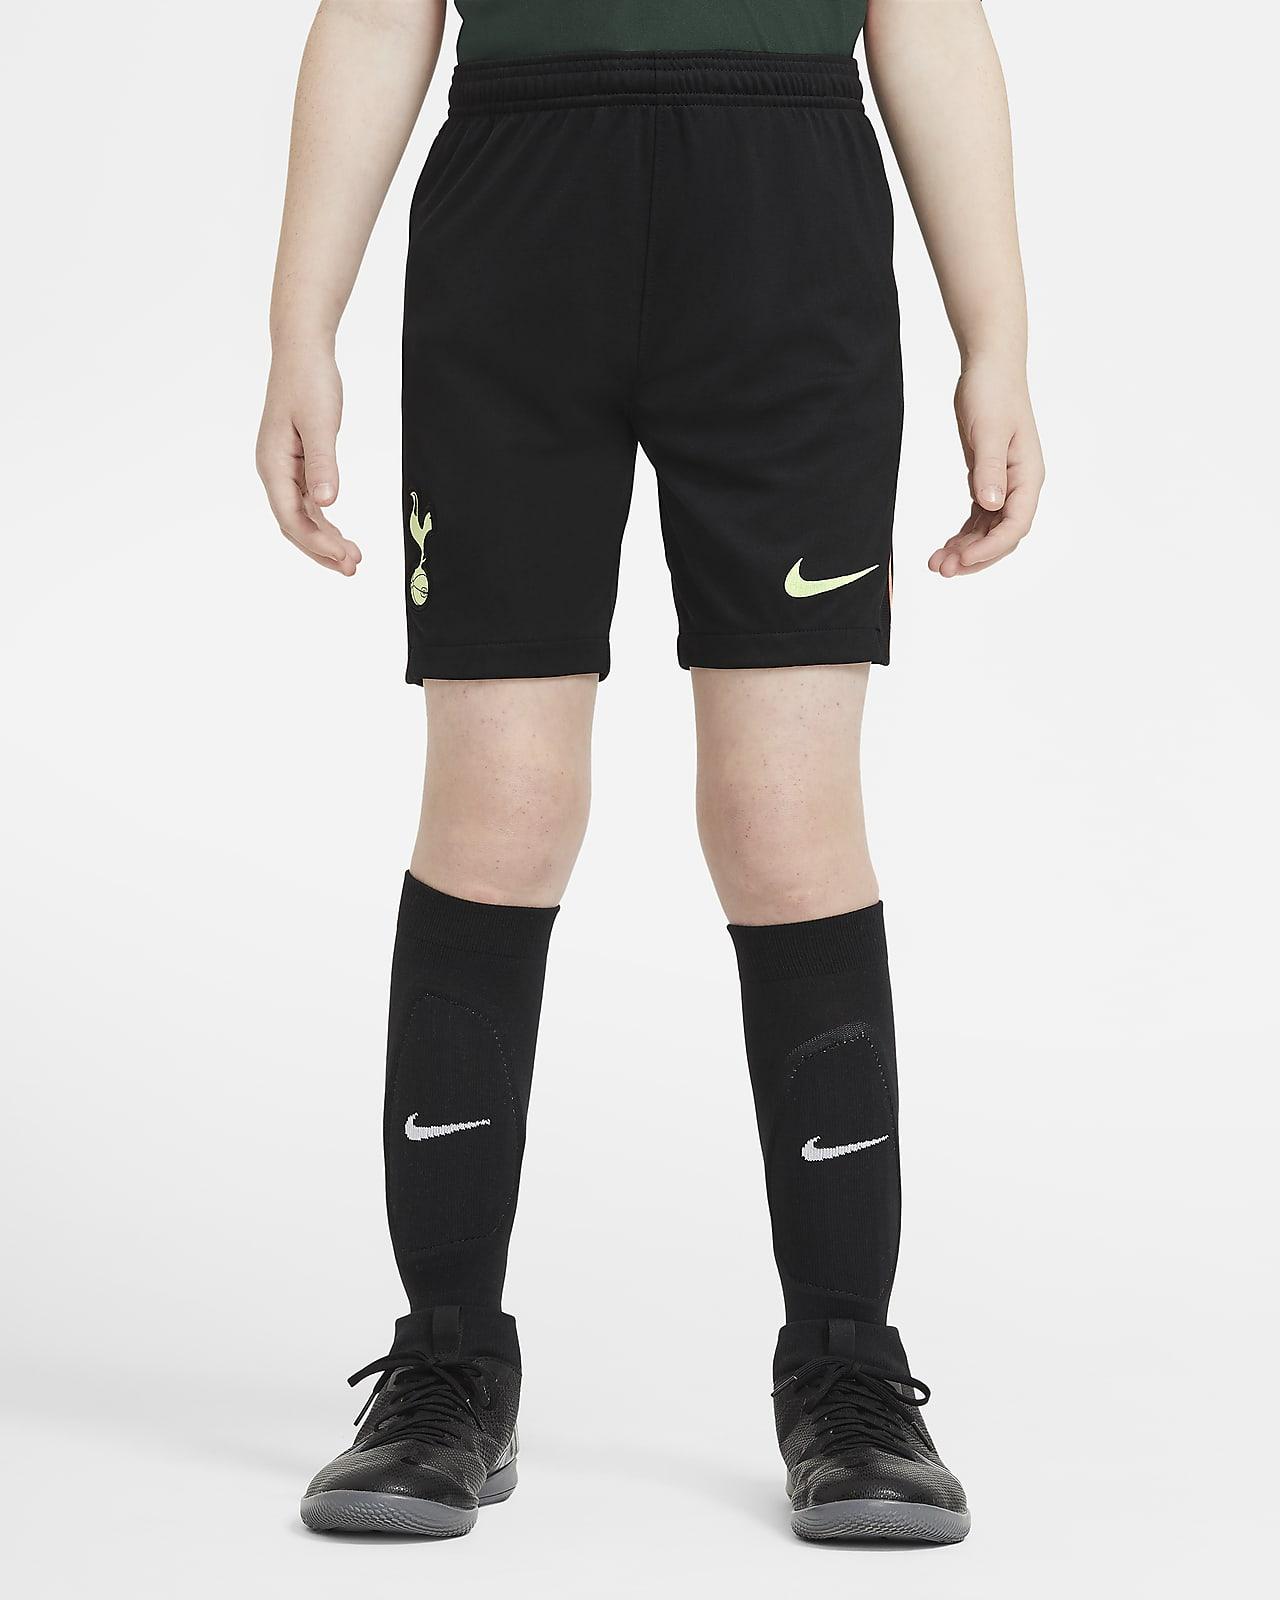 Tottenham Hotspur 2020/21 Stadium Home/Away Older Kids' Football Shorts